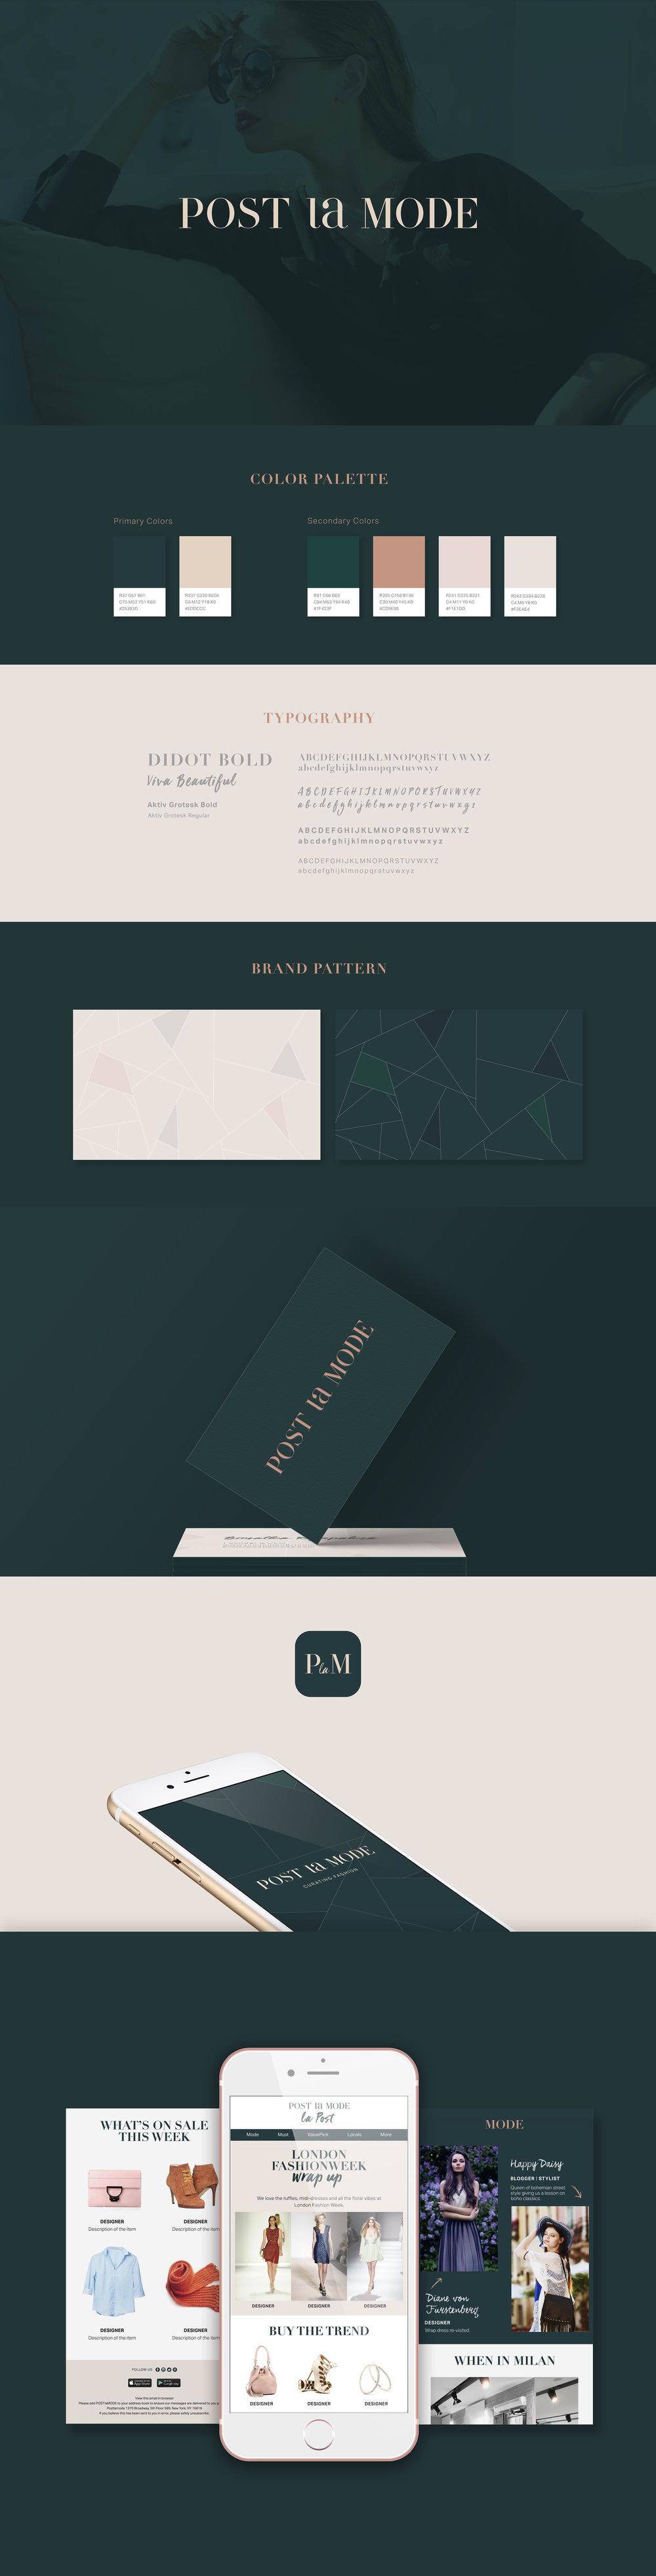 Ming-Hsuan Lee_Portfolio_POSTlaMODE-02.jpg